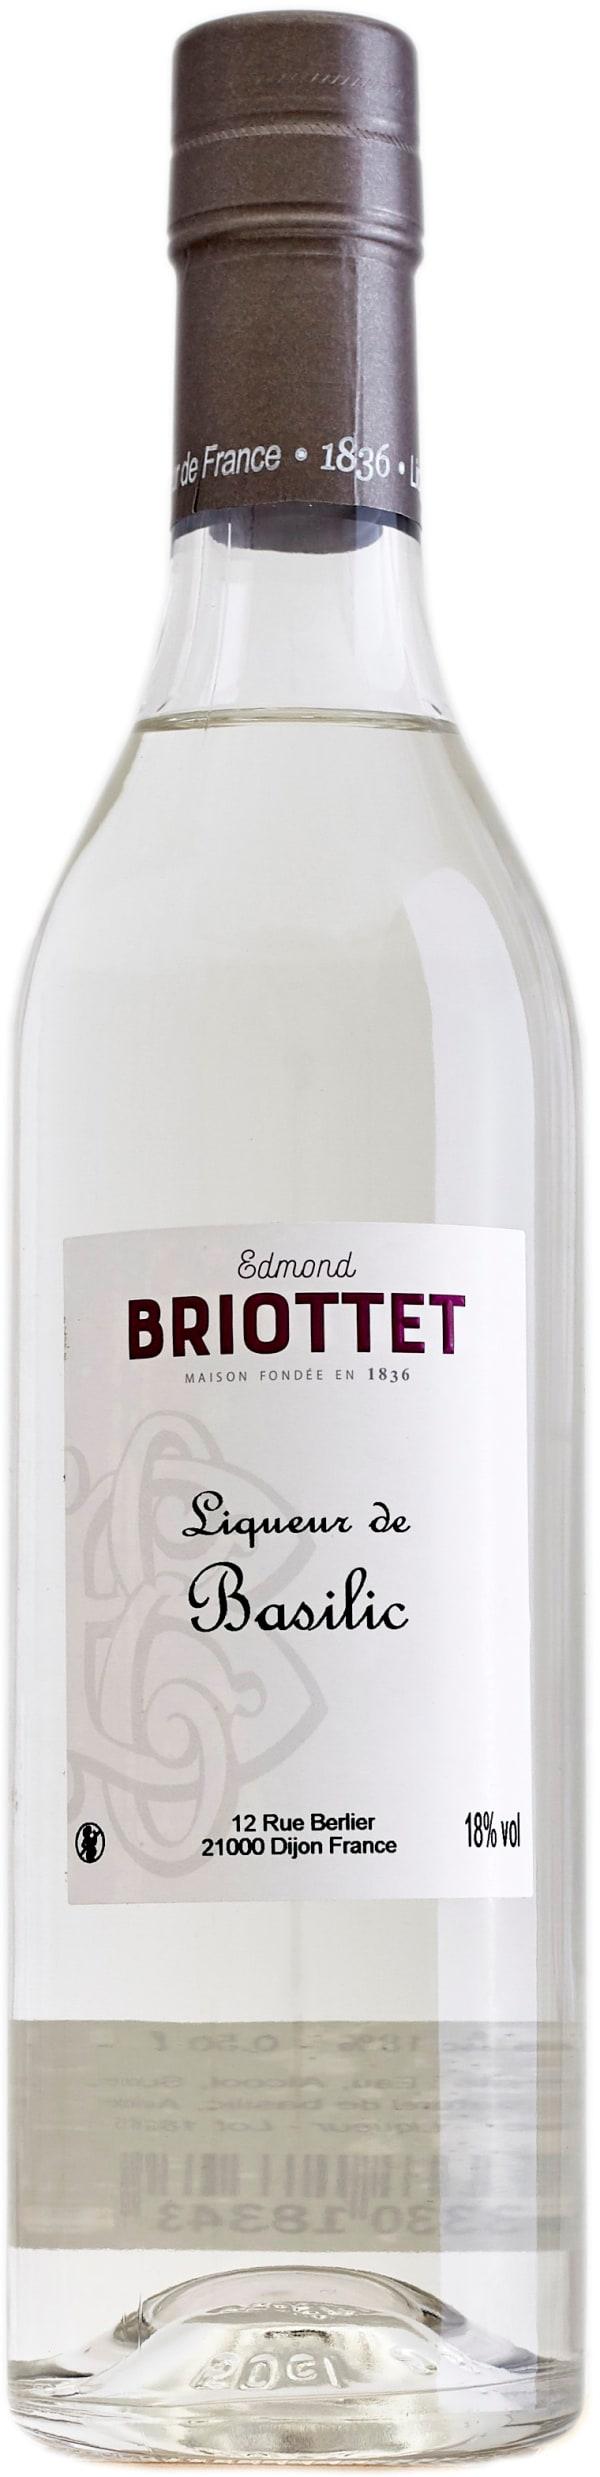 Edmond Briottet Liquer de Basilic